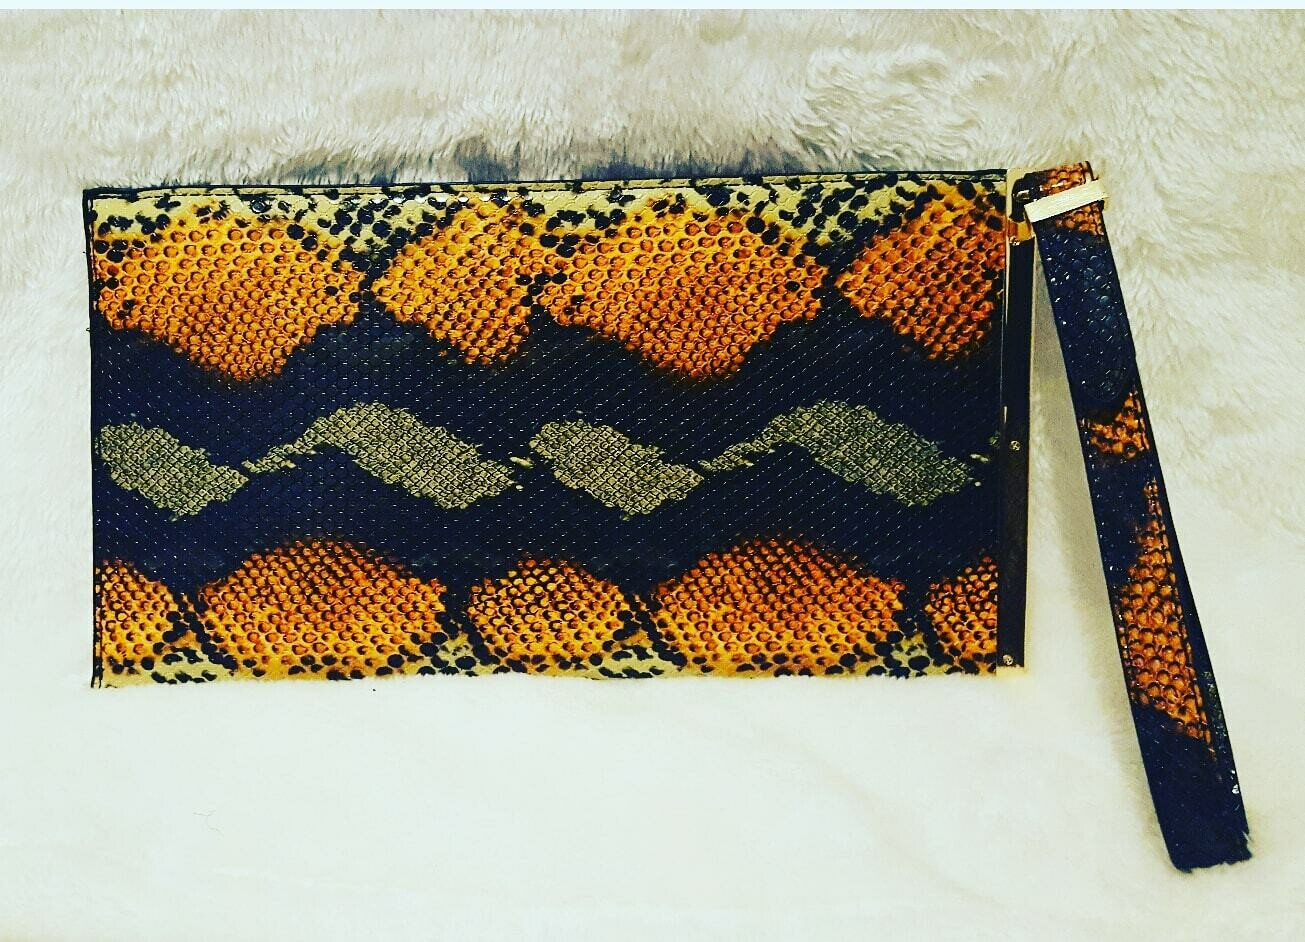 Snakeskin Designer Inspired Clutch